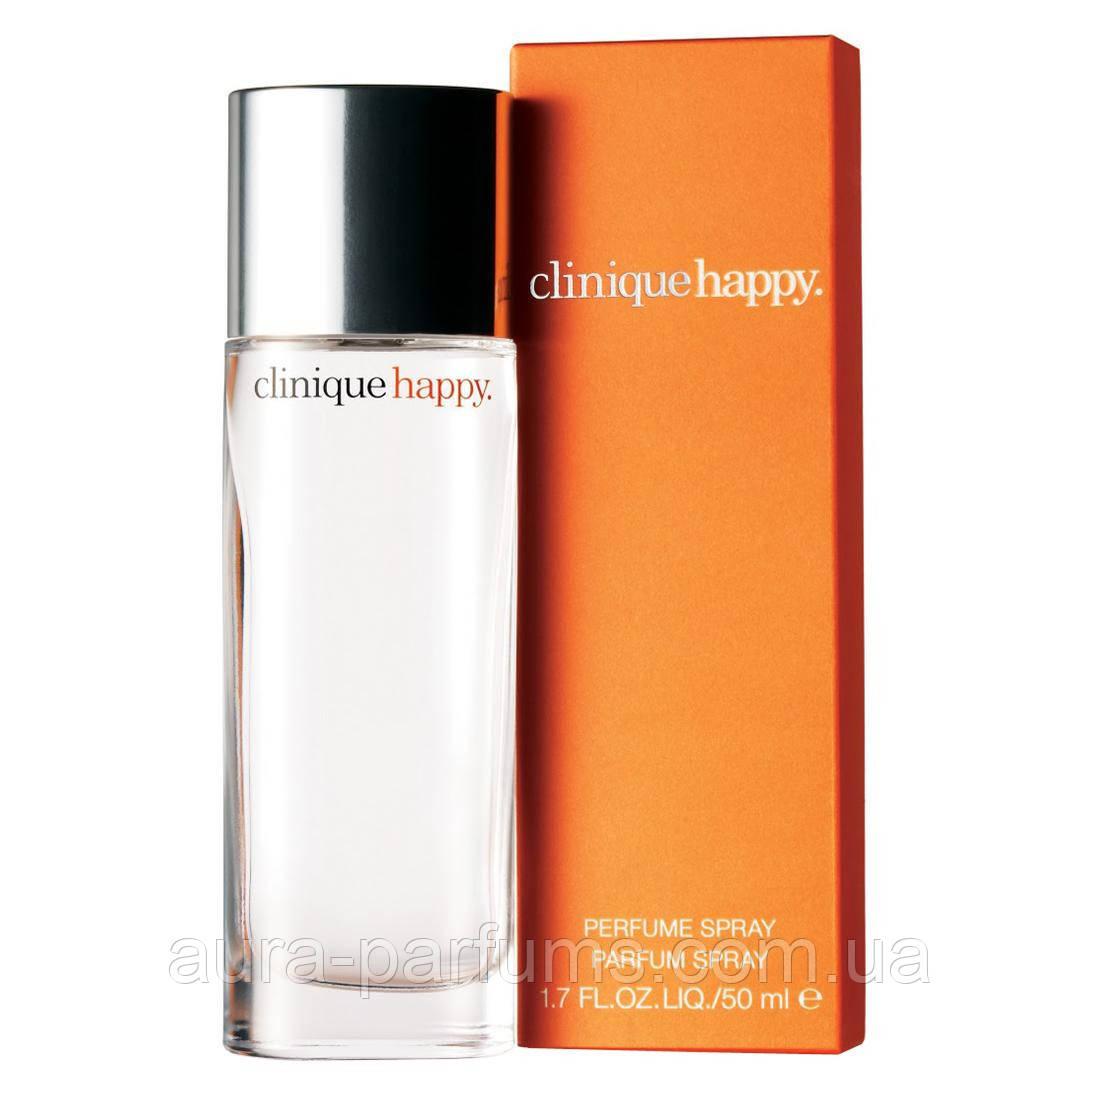 Clinique Happy edp Люкс 100 ml. w лицензия - Интернет-магазин парфюмерии и косметики | Aura-Parfums в Ровненской области